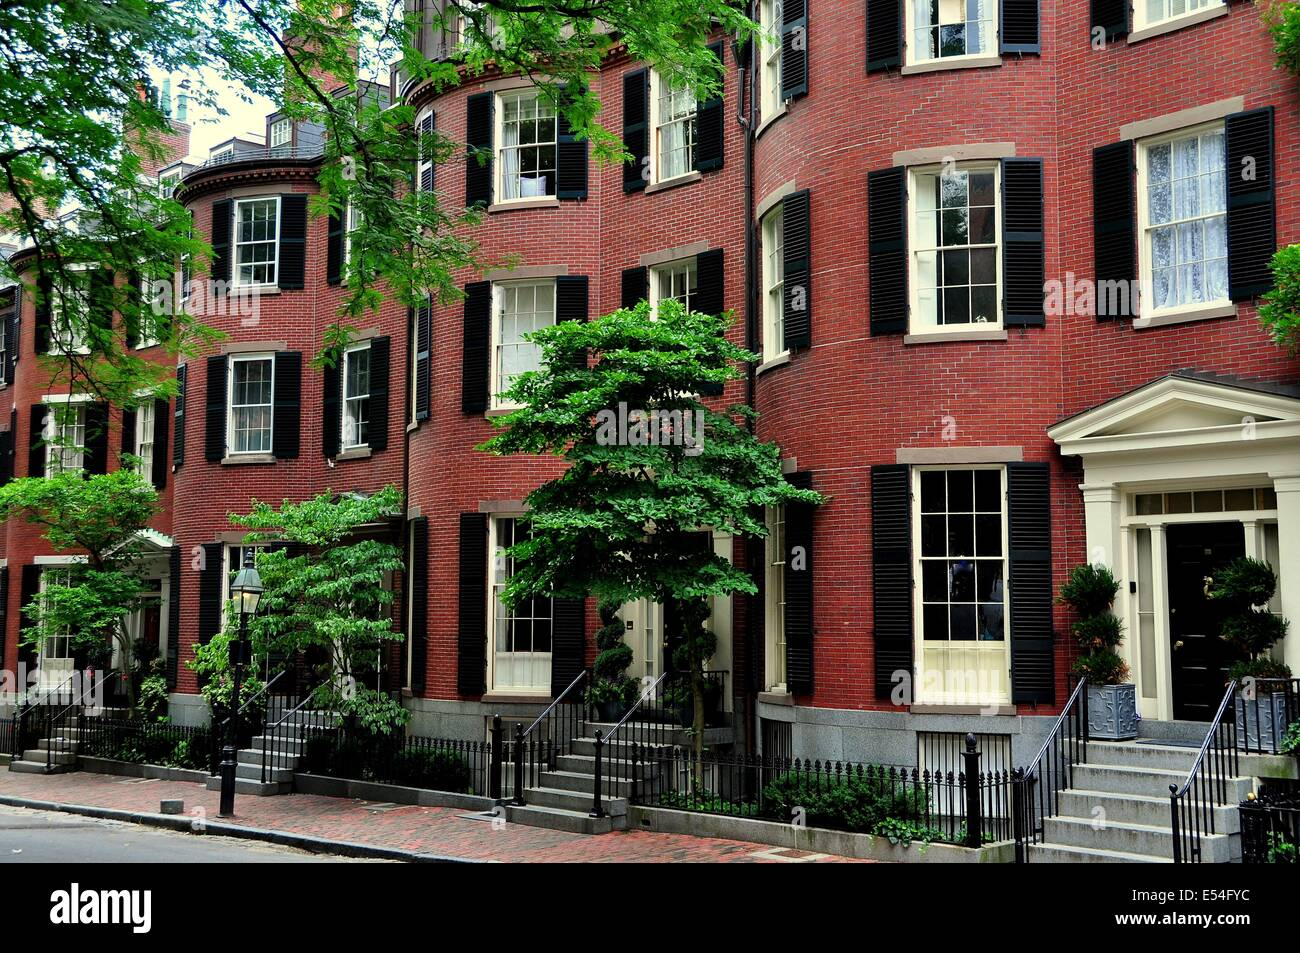 Boston Massachusetts 19th Century Brick Homes With Front